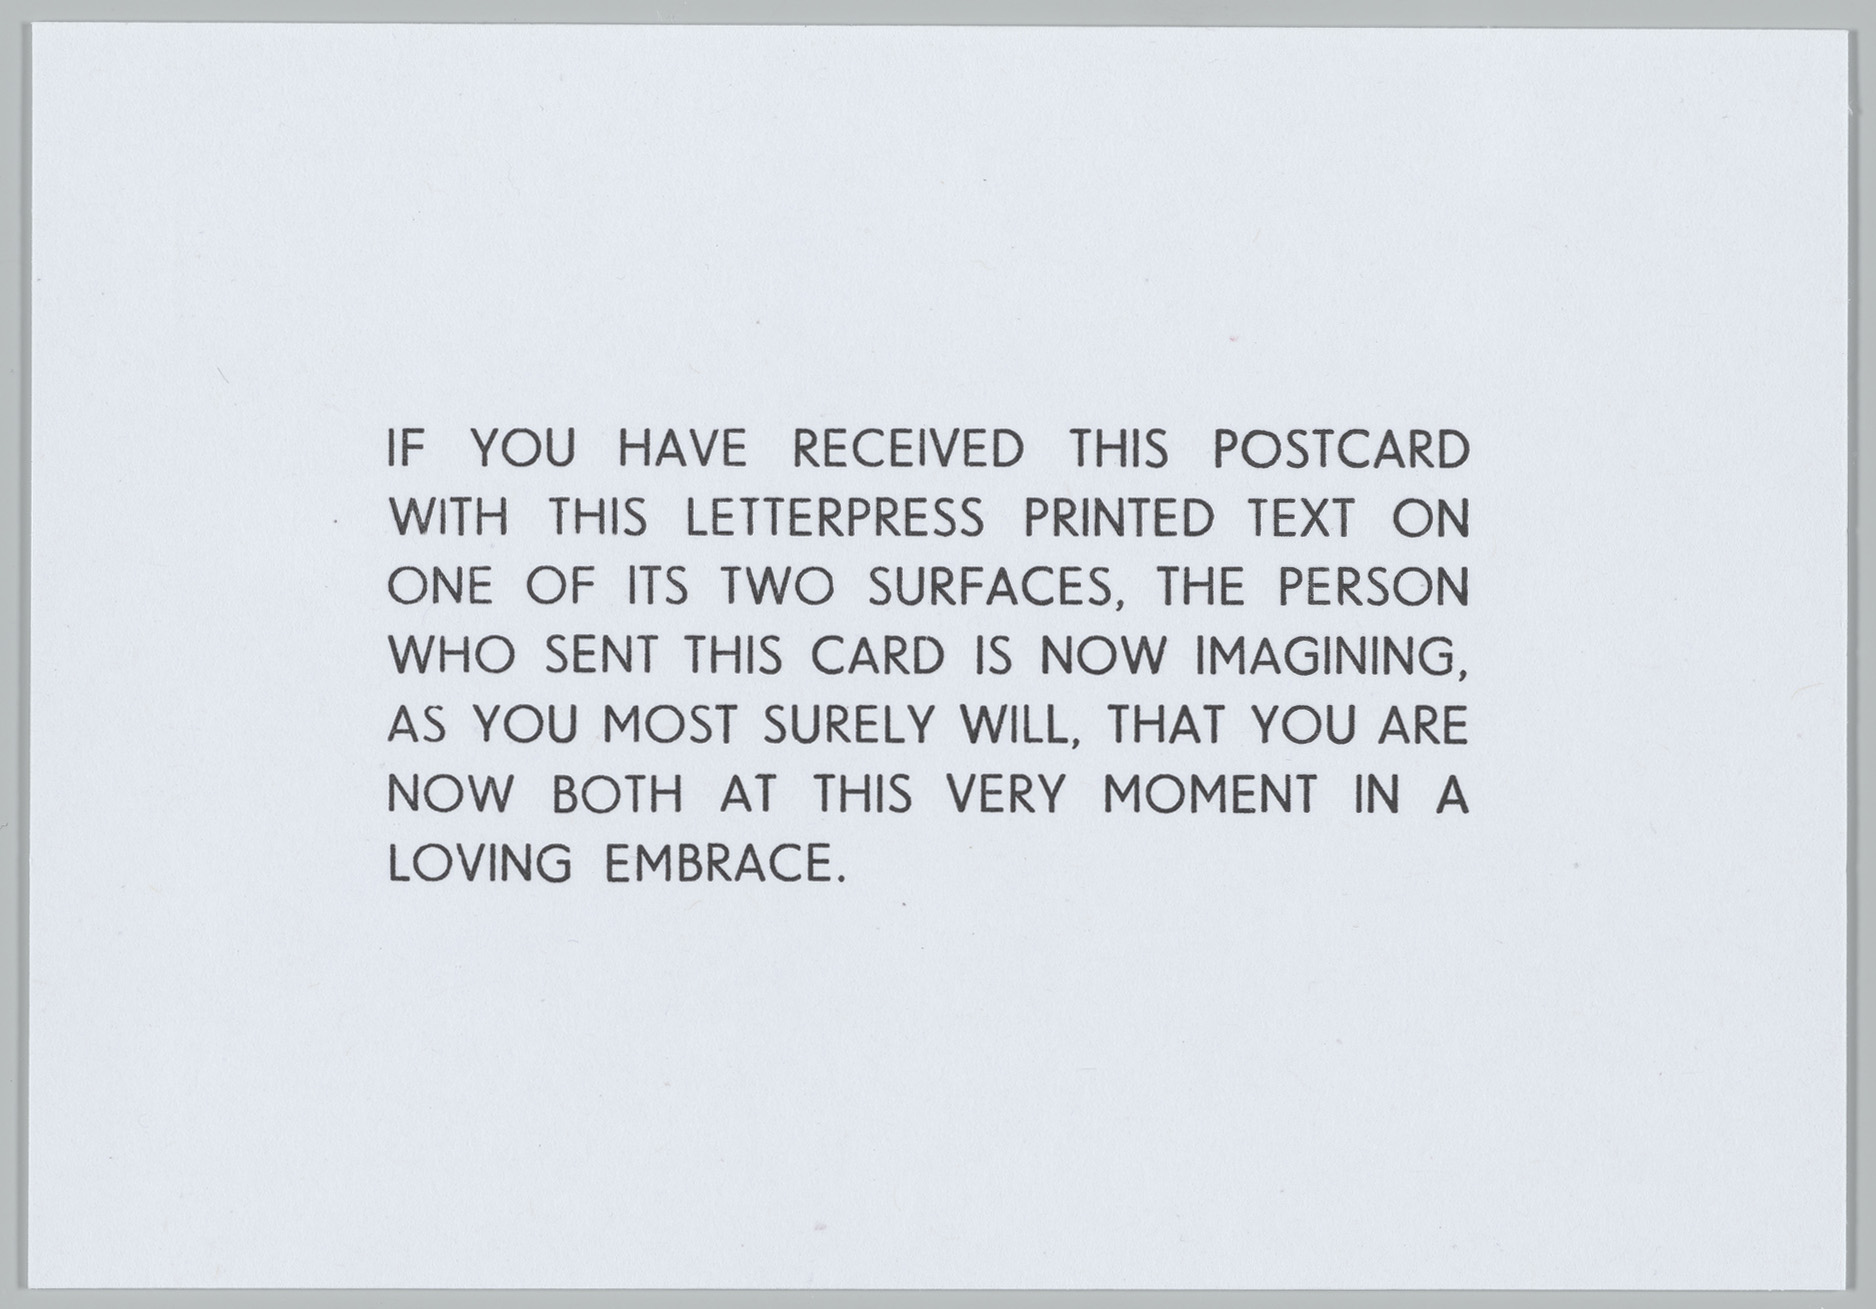 White postcard with black letterpress text.